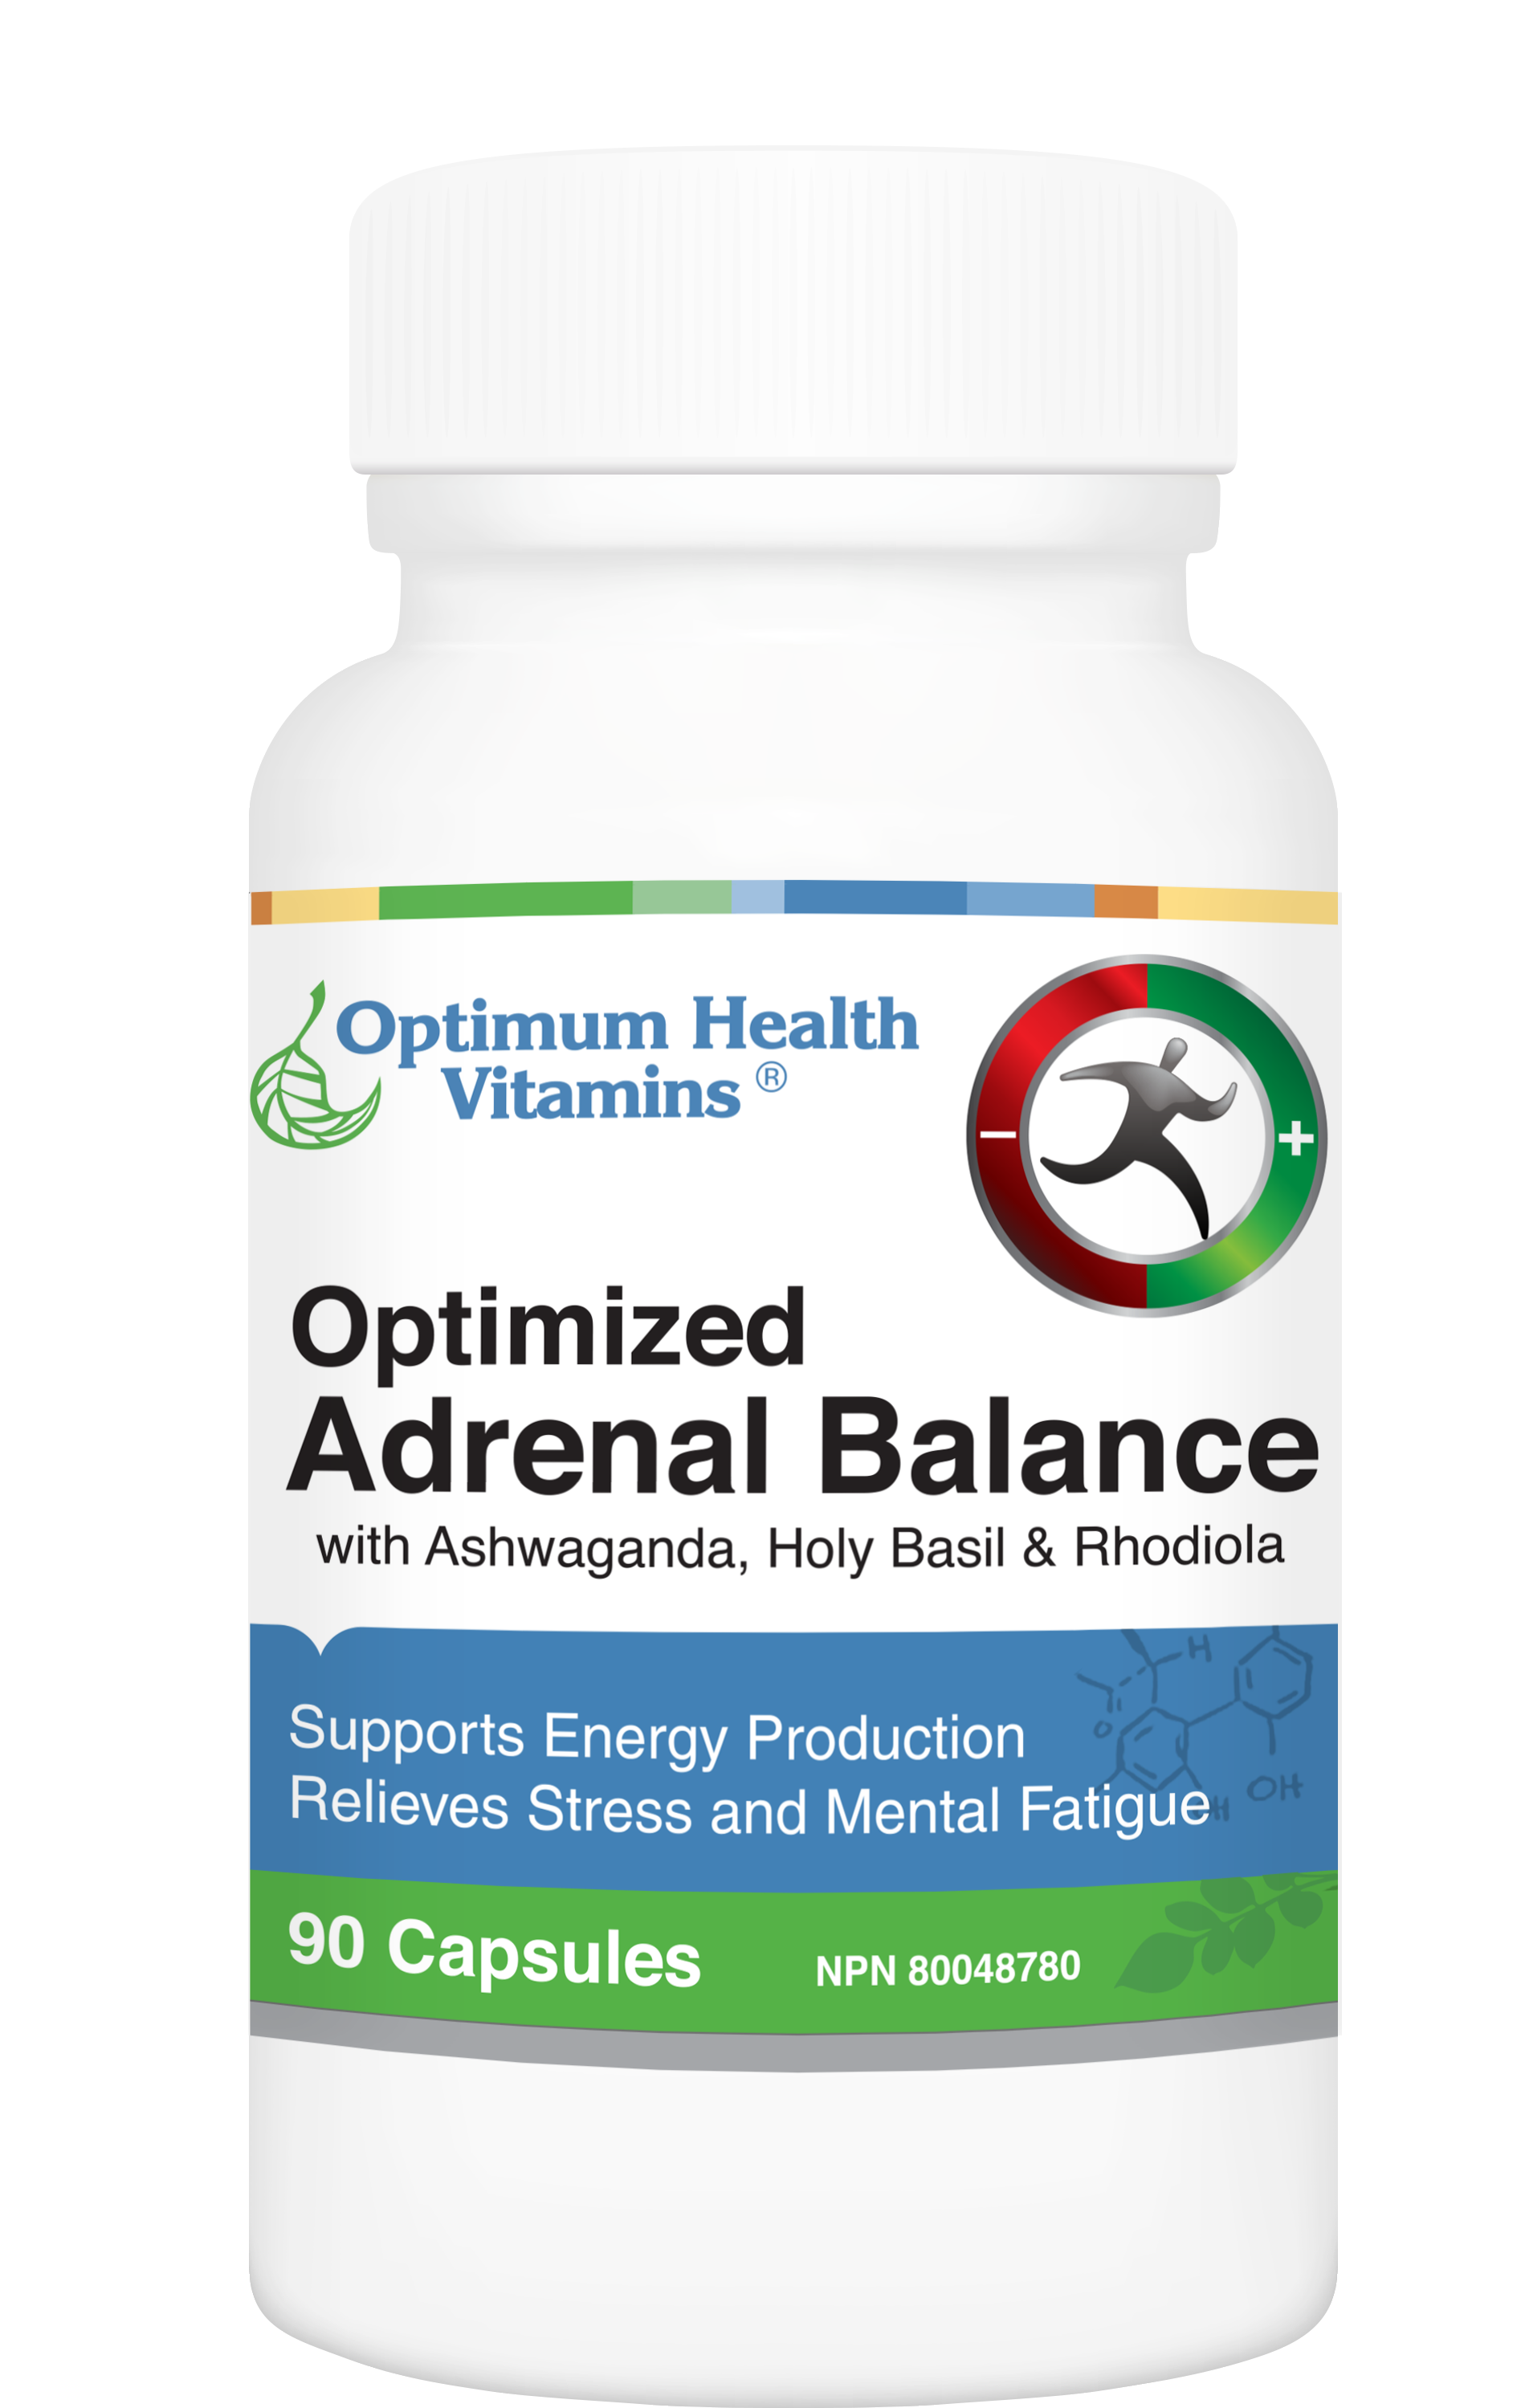 Optimum Health Vitamins Optimized Adrenal Balance